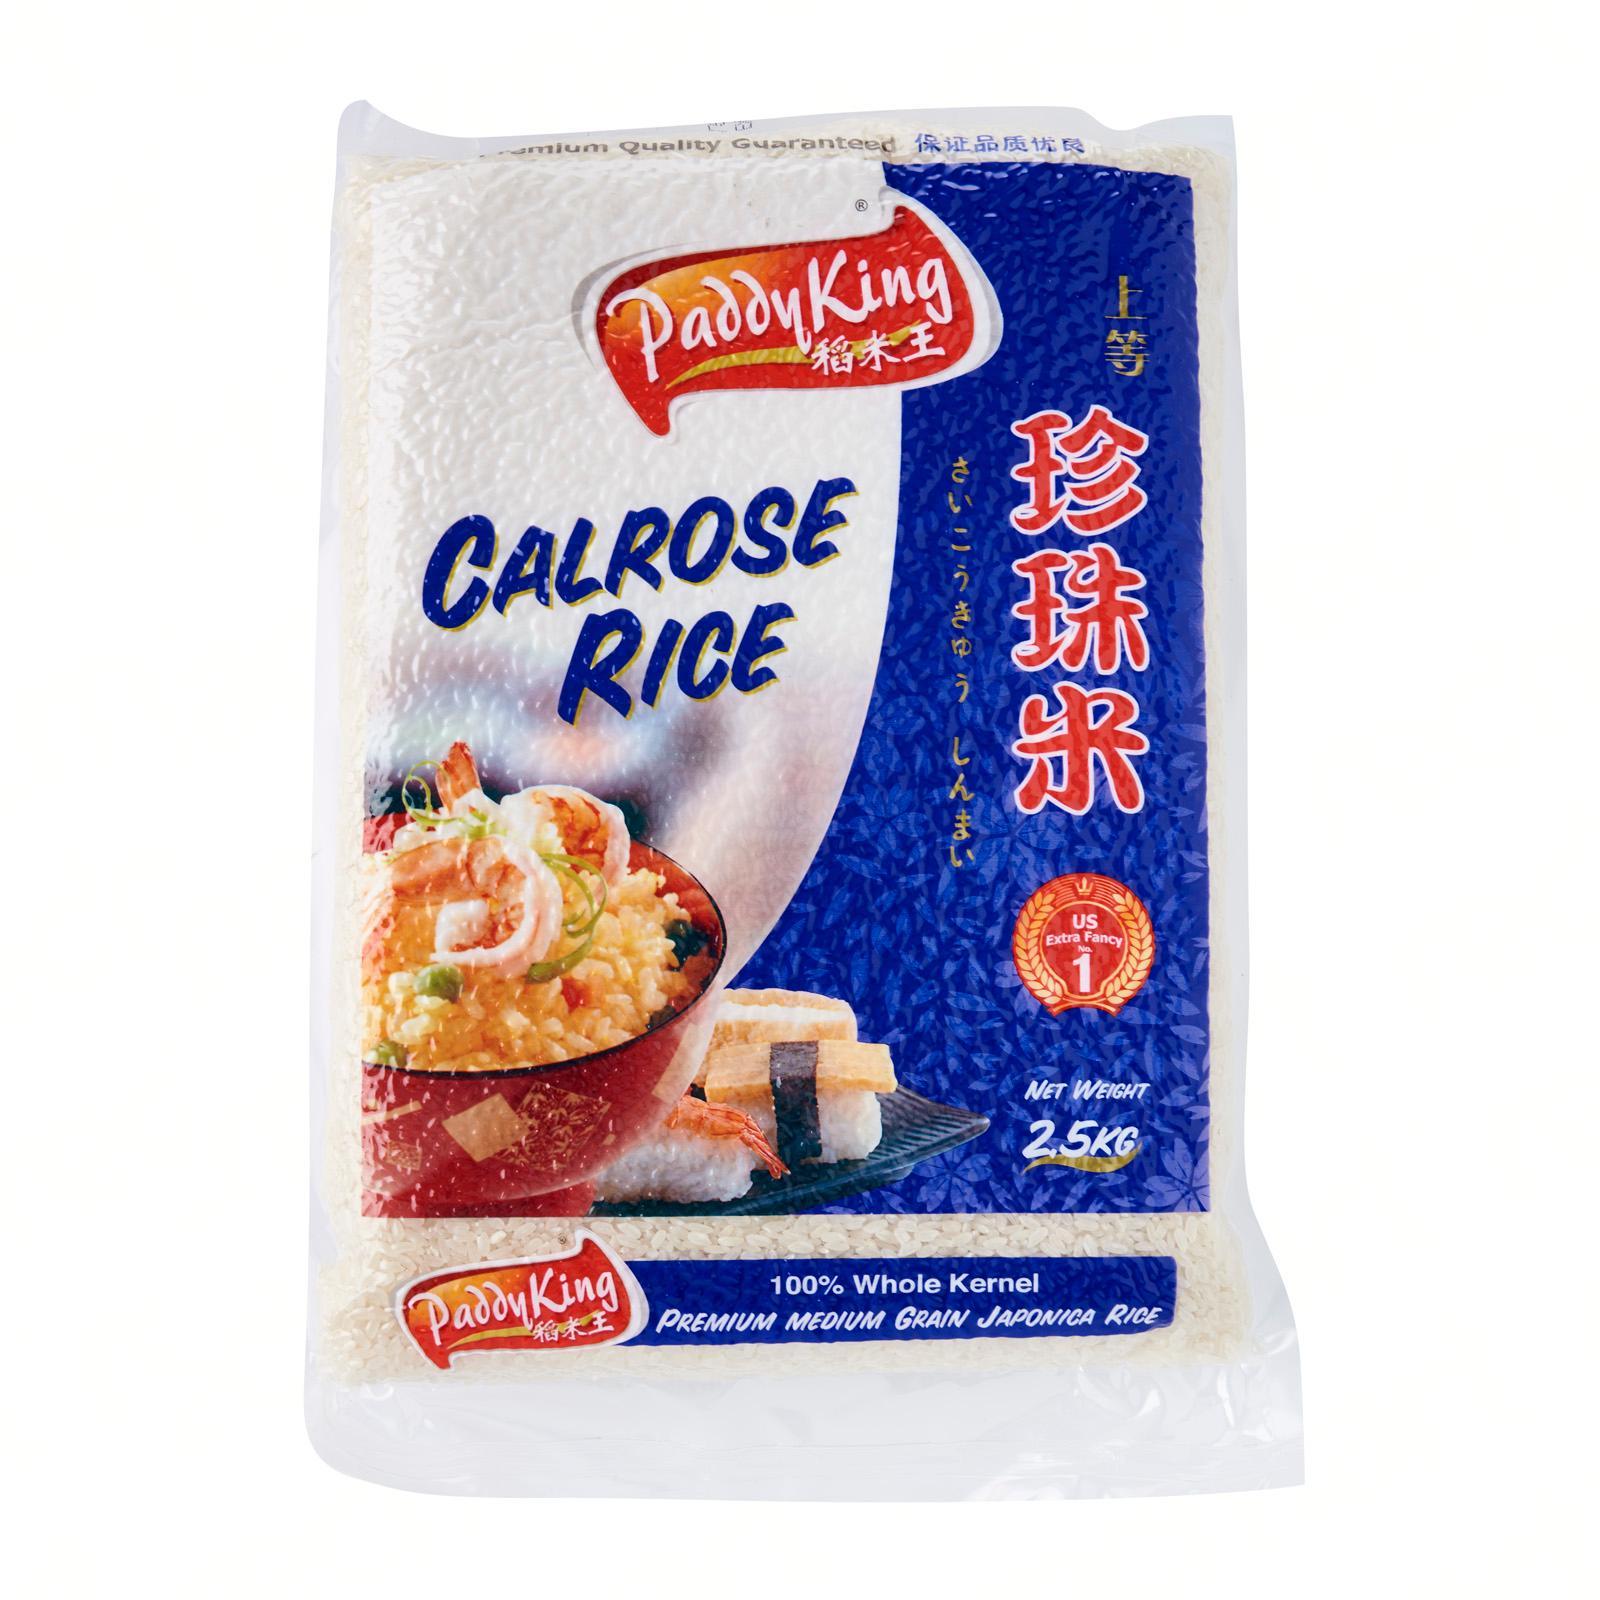 Paddyking USA Premium Calrose Rice